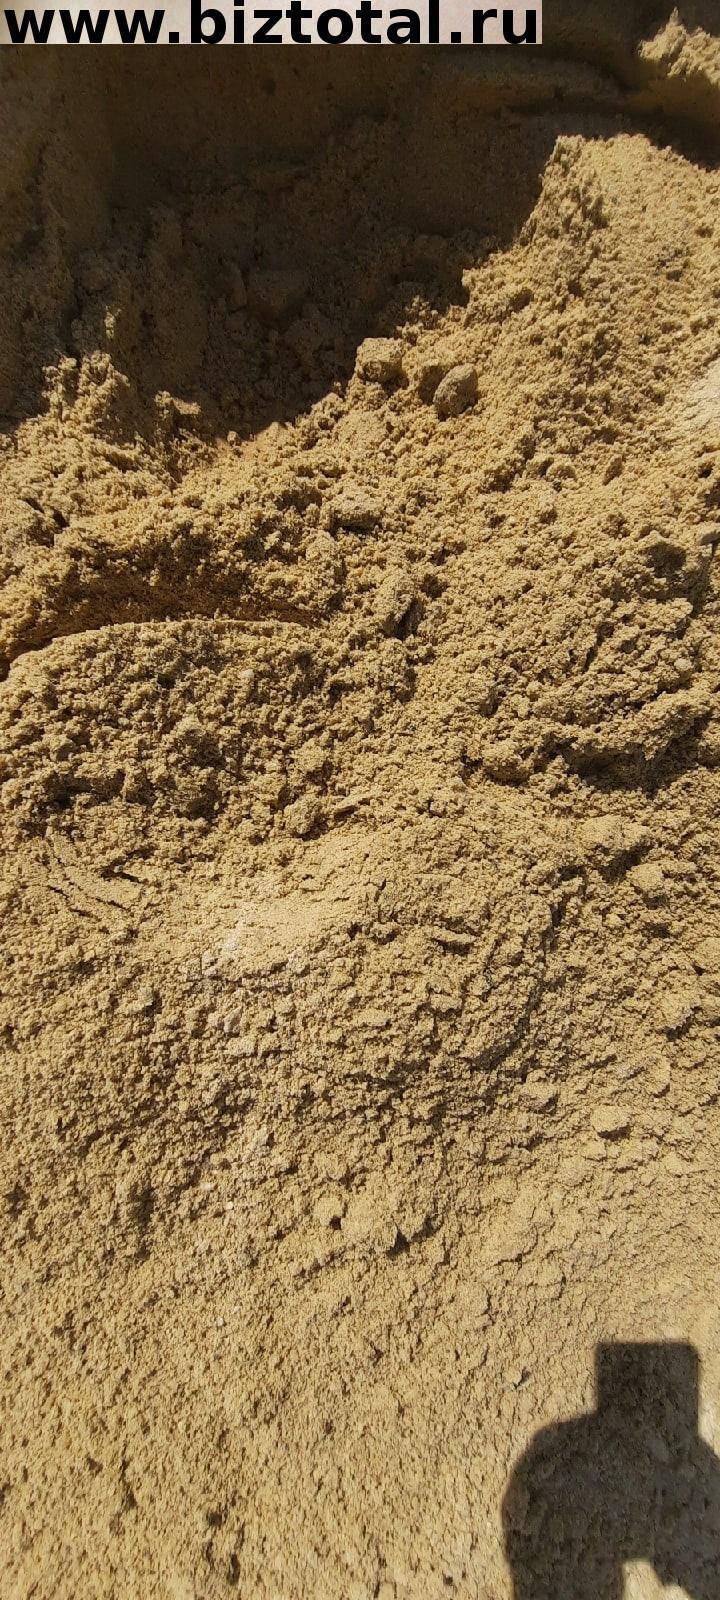 Карьер песчаный